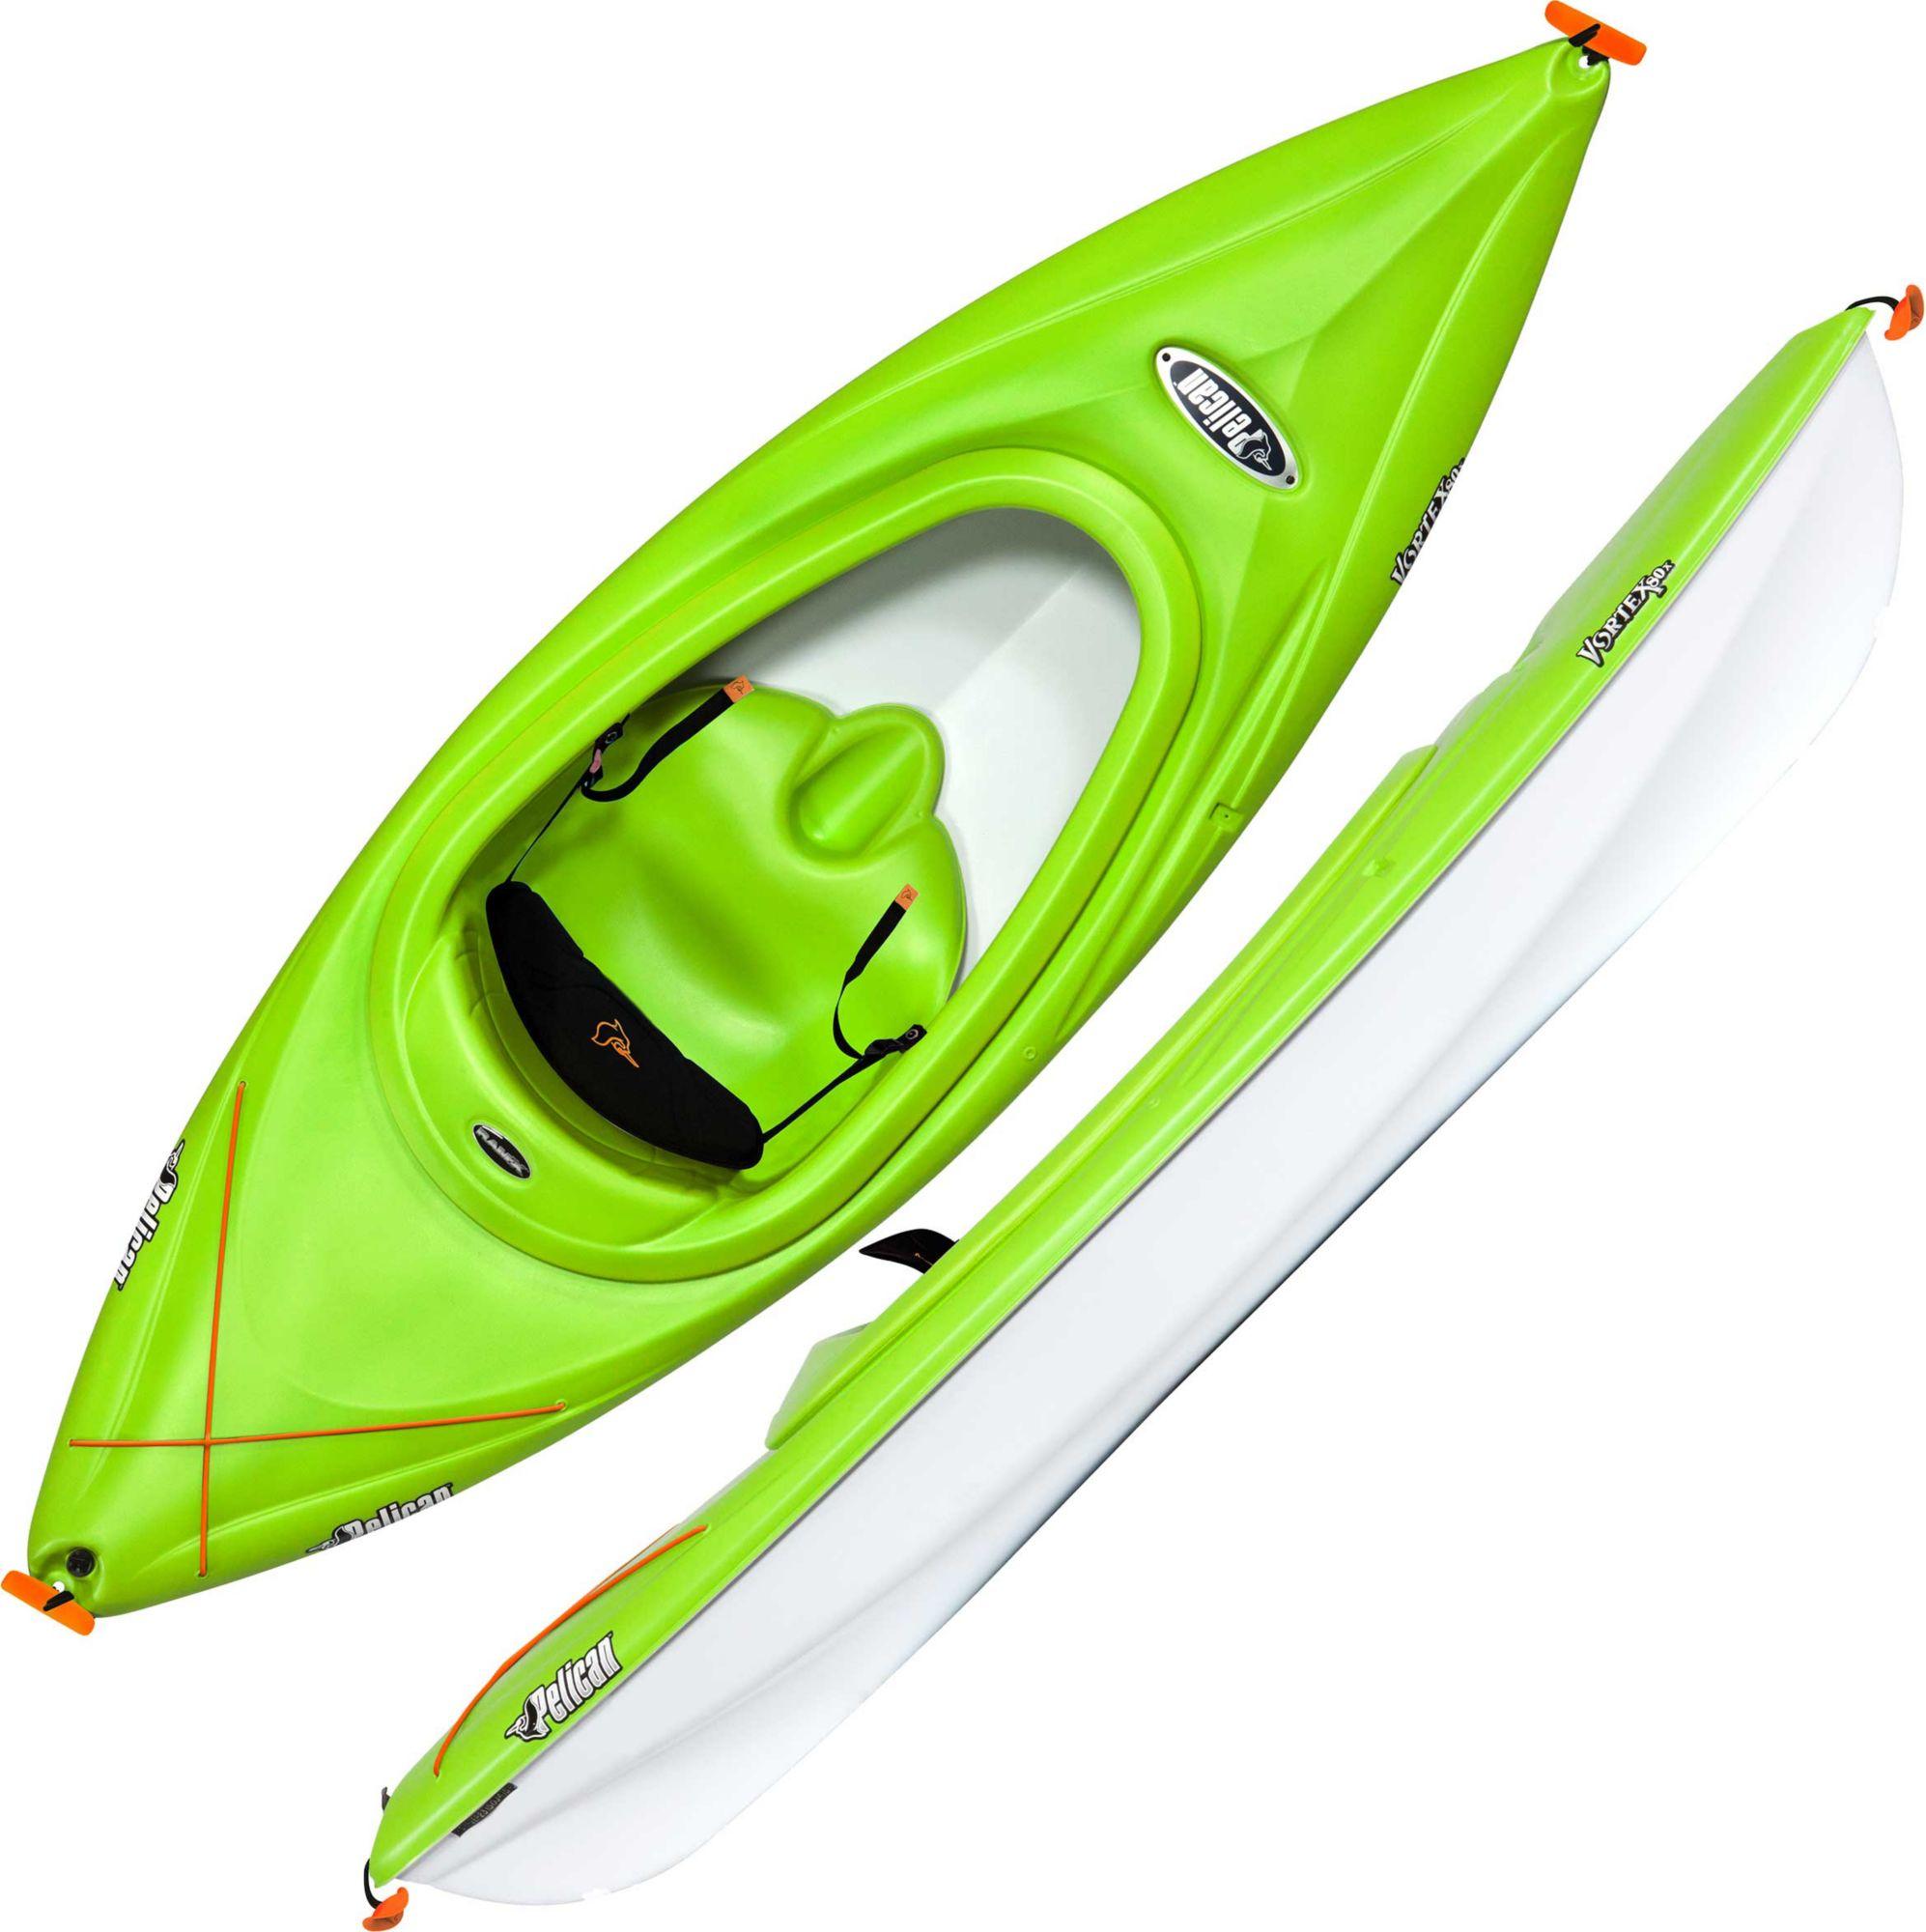 Pelican Vortex DLX 80 Kayak $129 with Free In-Store Pick-Up